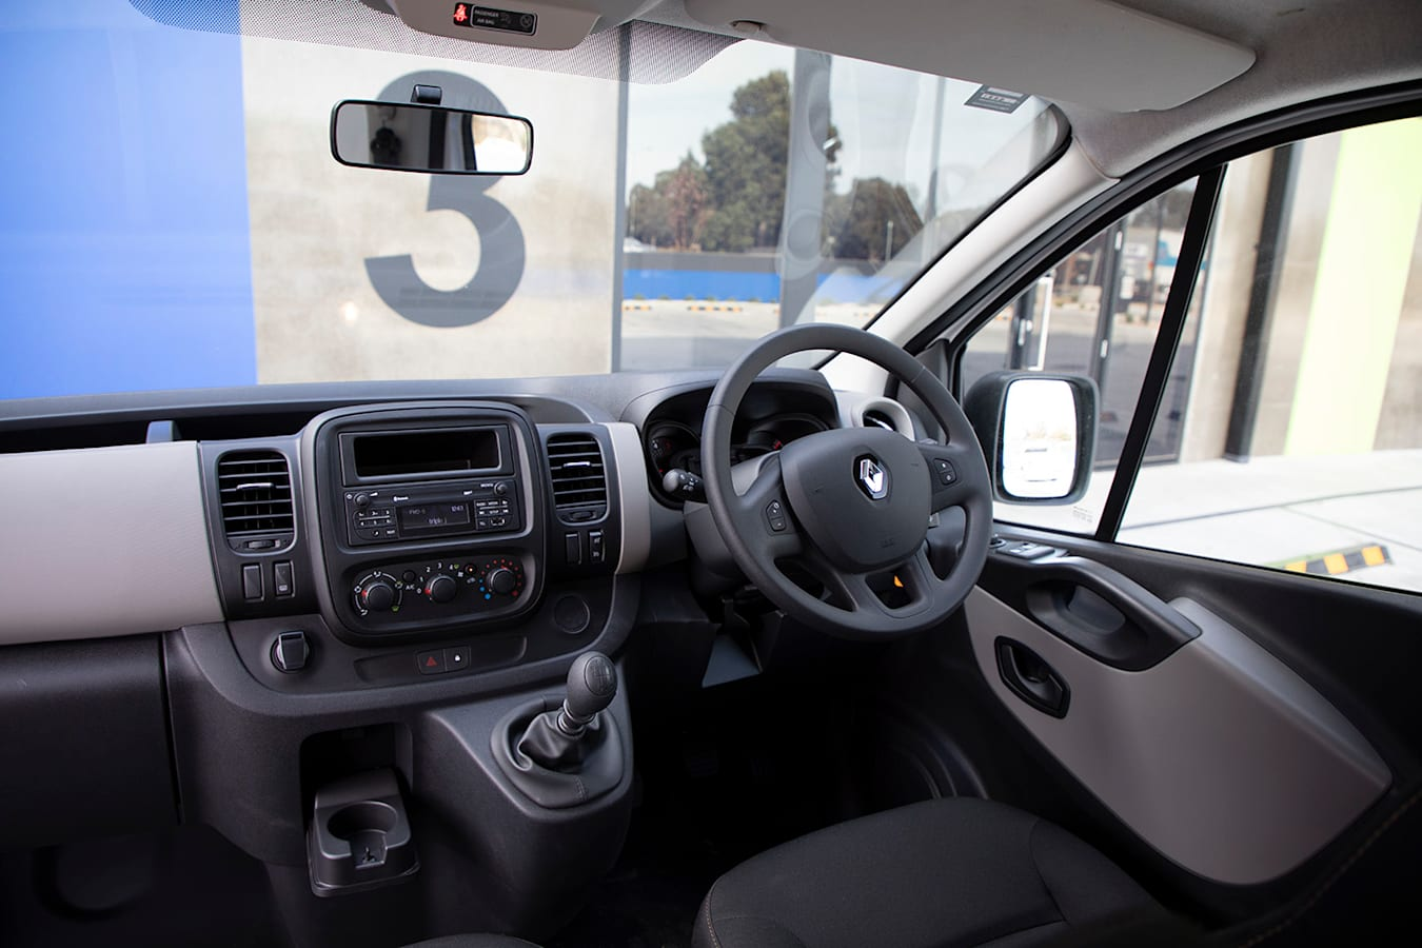 2019 Renault Trafic Traderlife Review Interior Dashboard Jpg